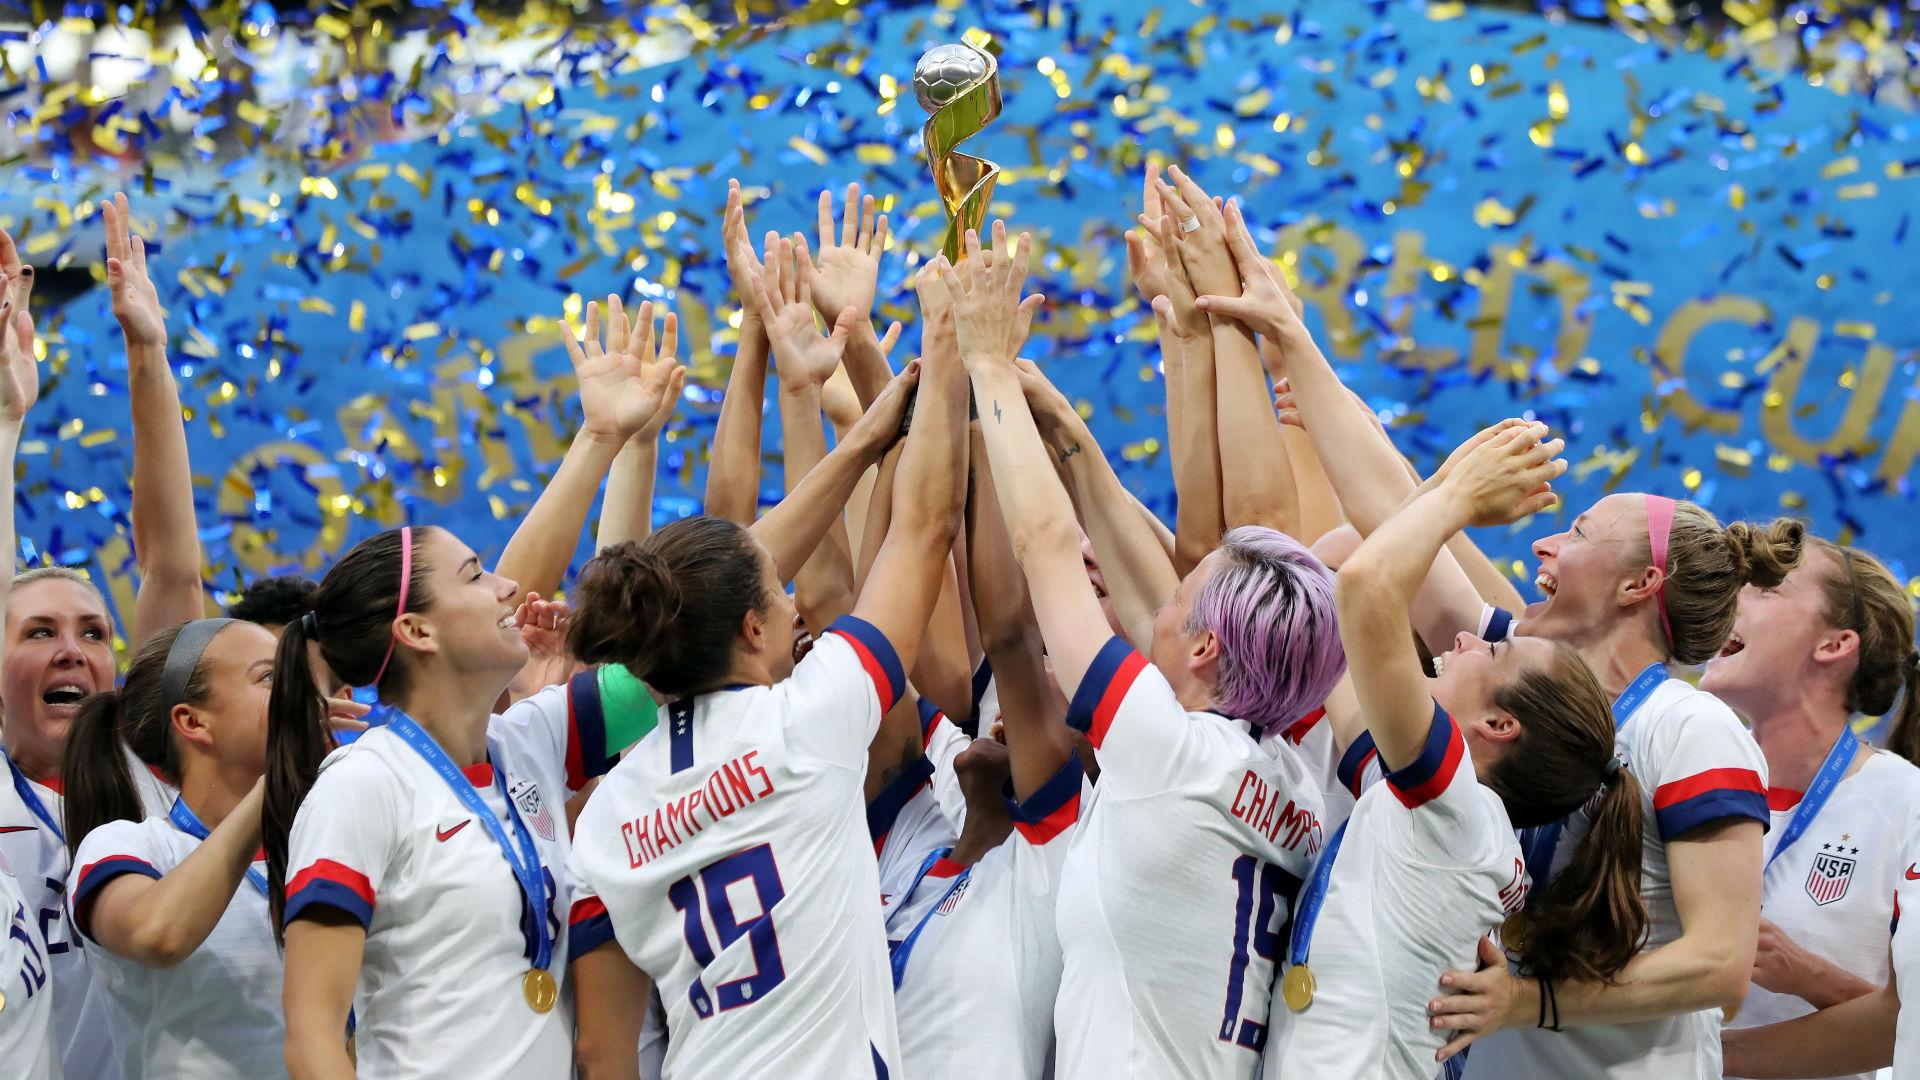 women's world cup fixtures, world cup soccer matches